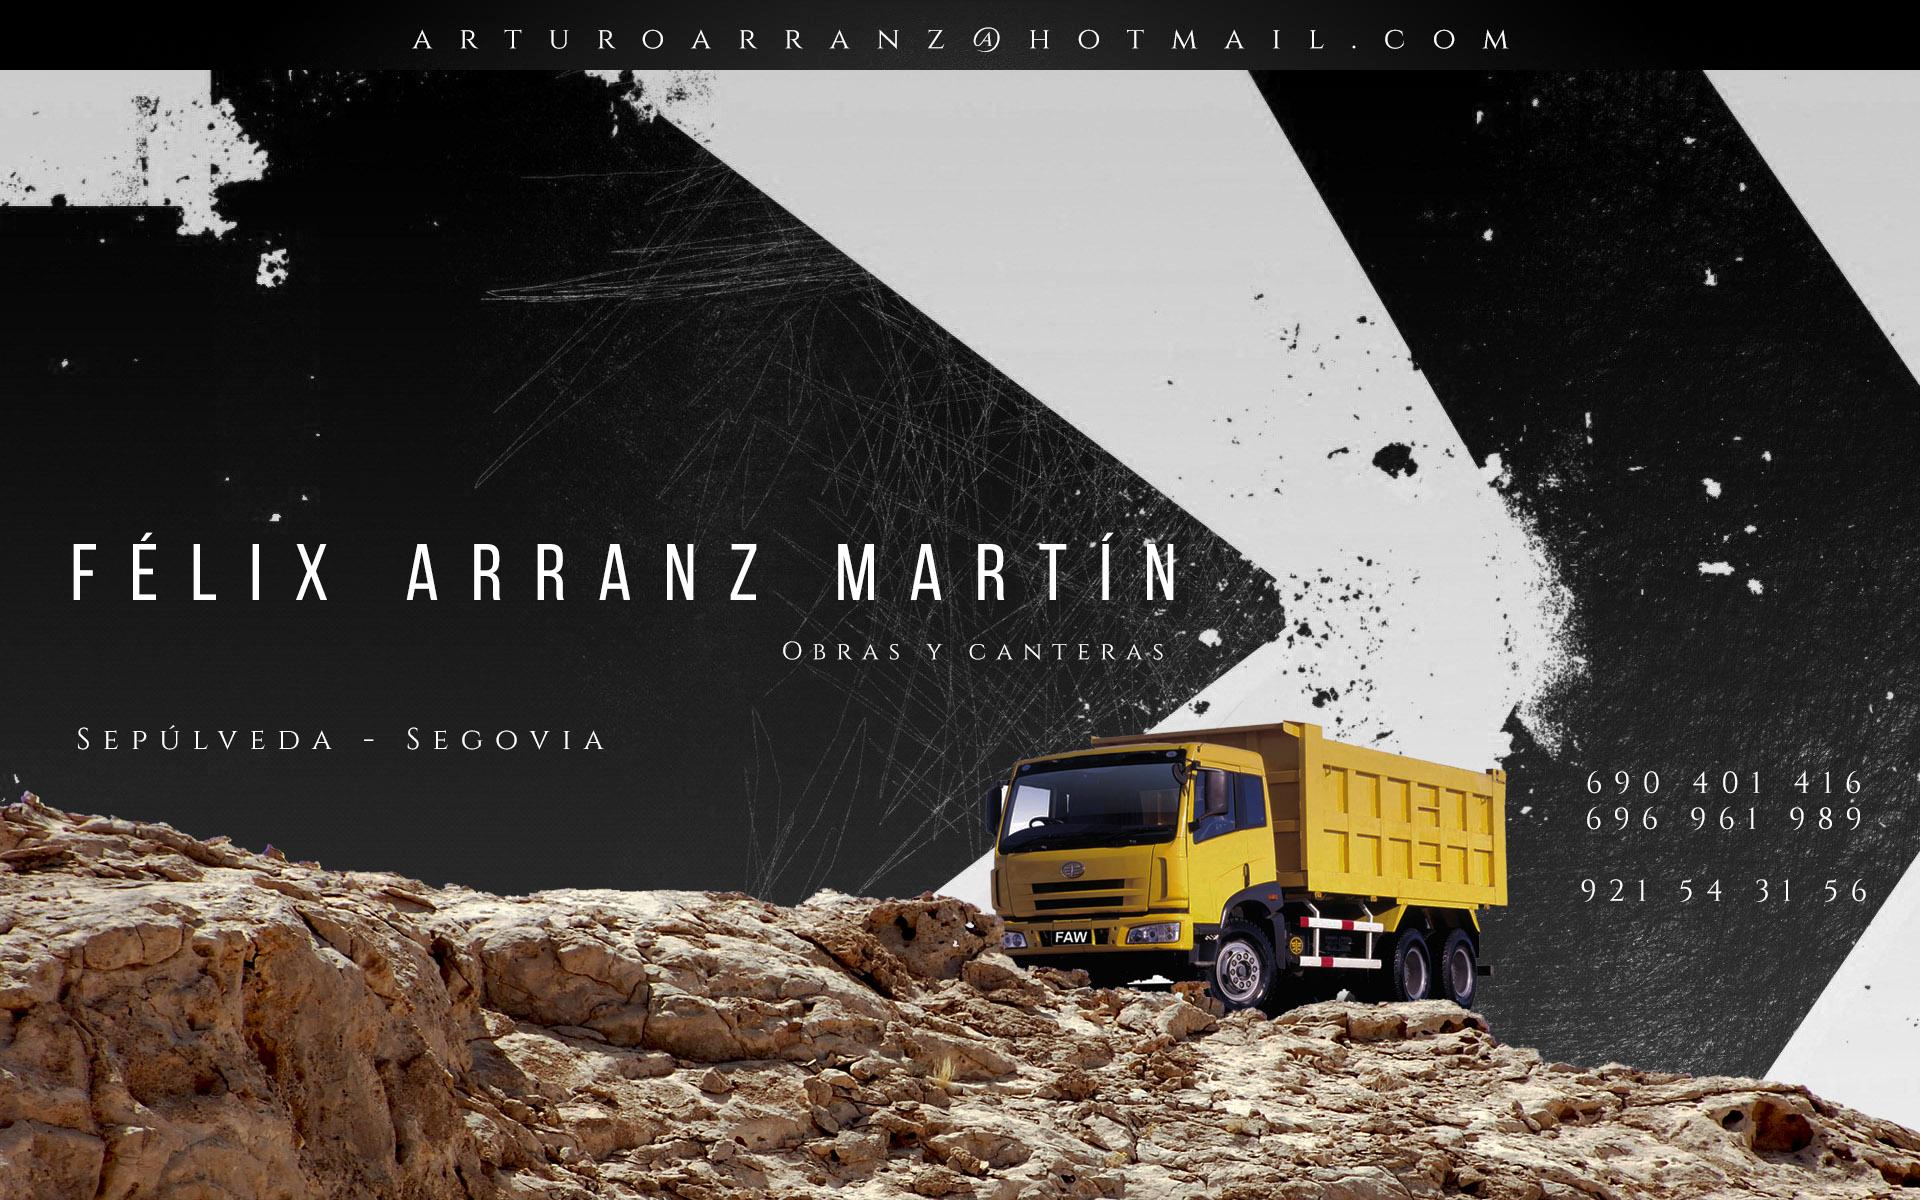 Felix-Arranz-Martin-1b